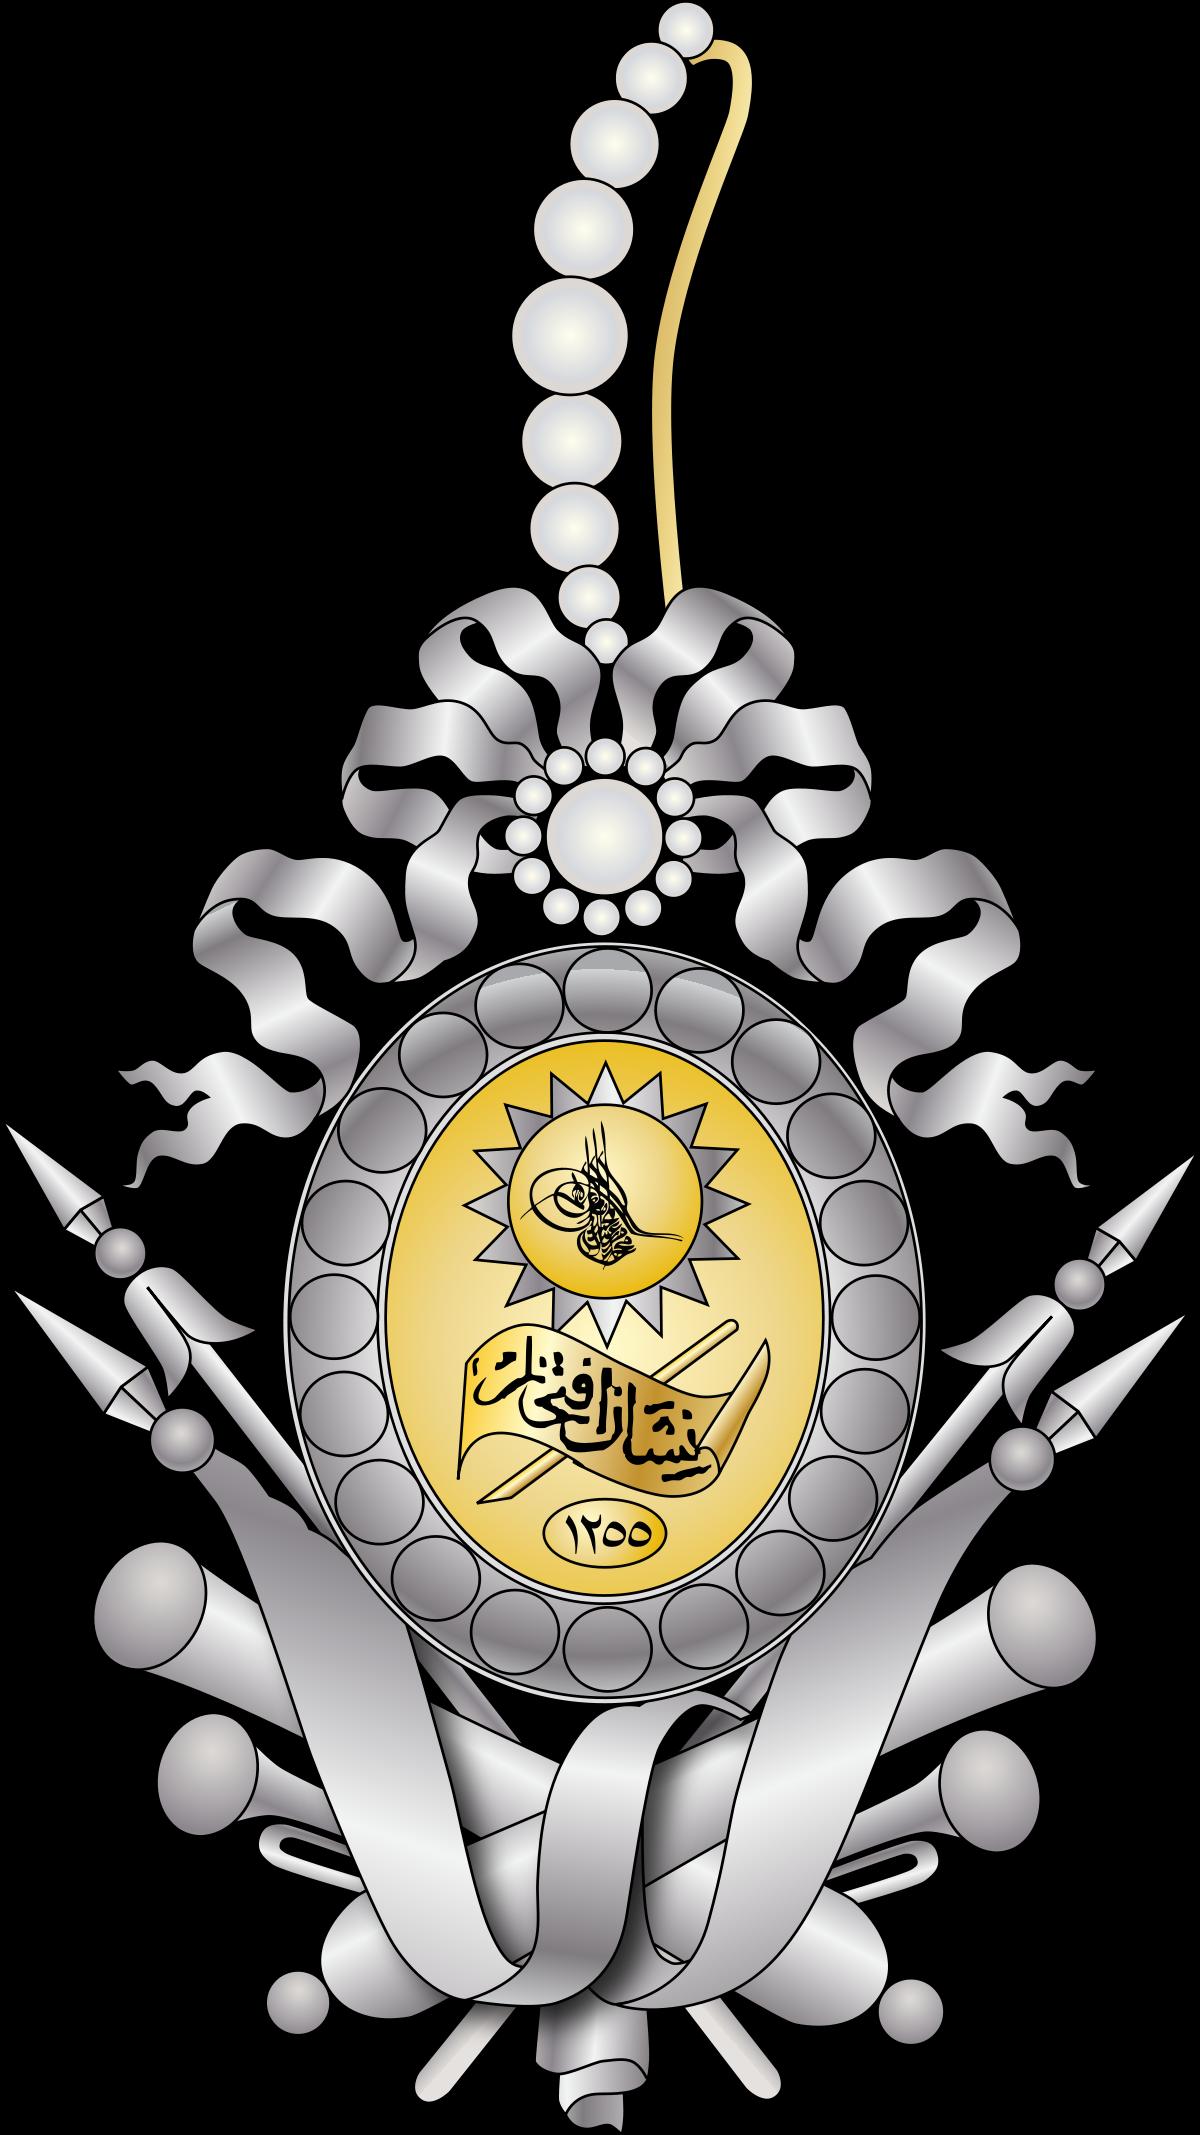 Clipart ruler rular. Vizier wikipedia